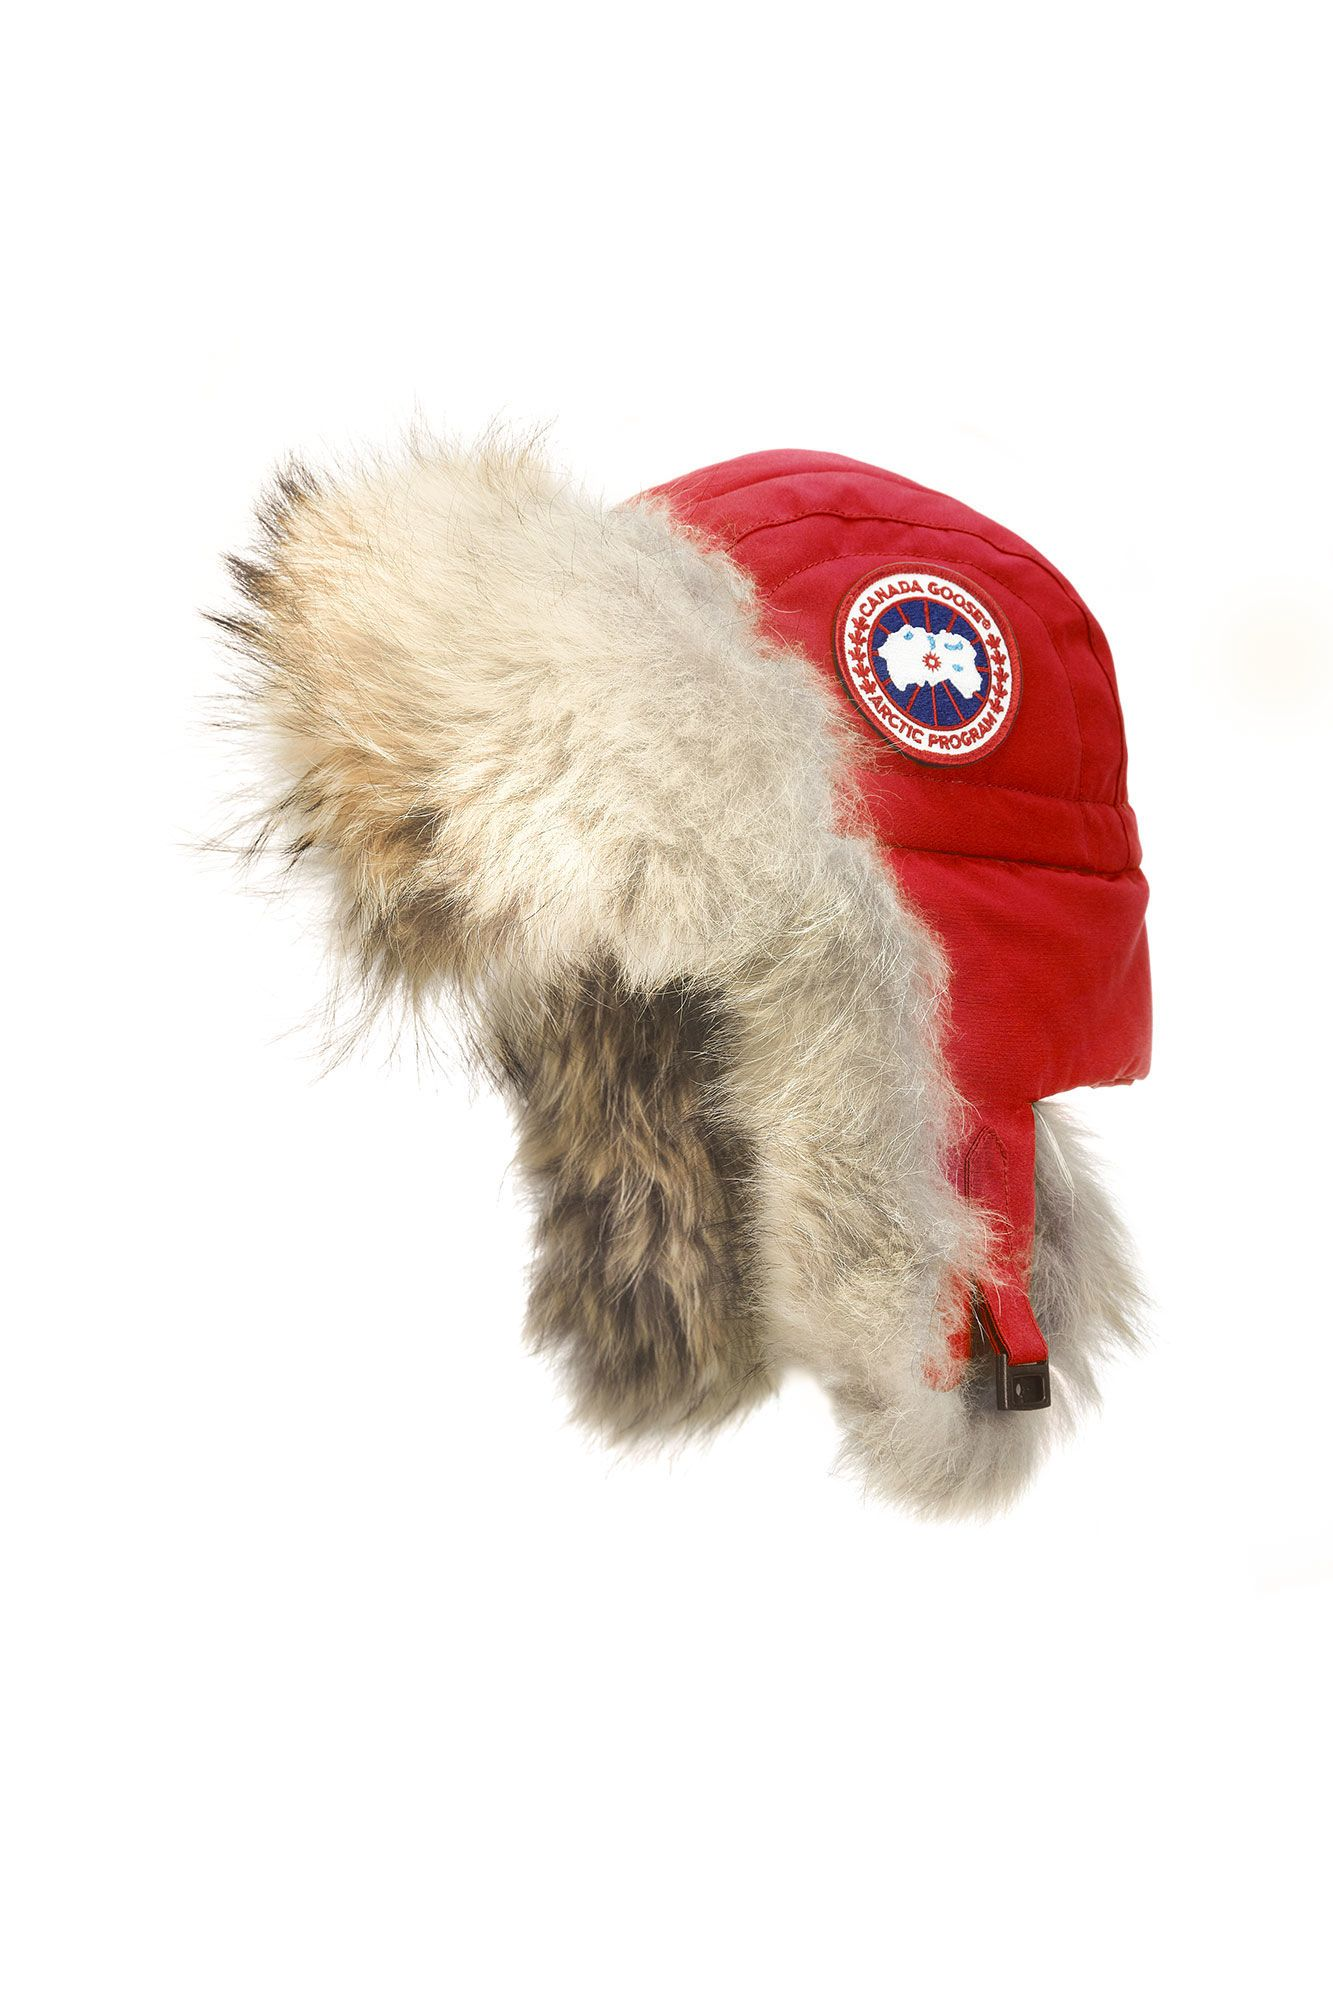 Aviator hat aviator hat winter jackets canada goose